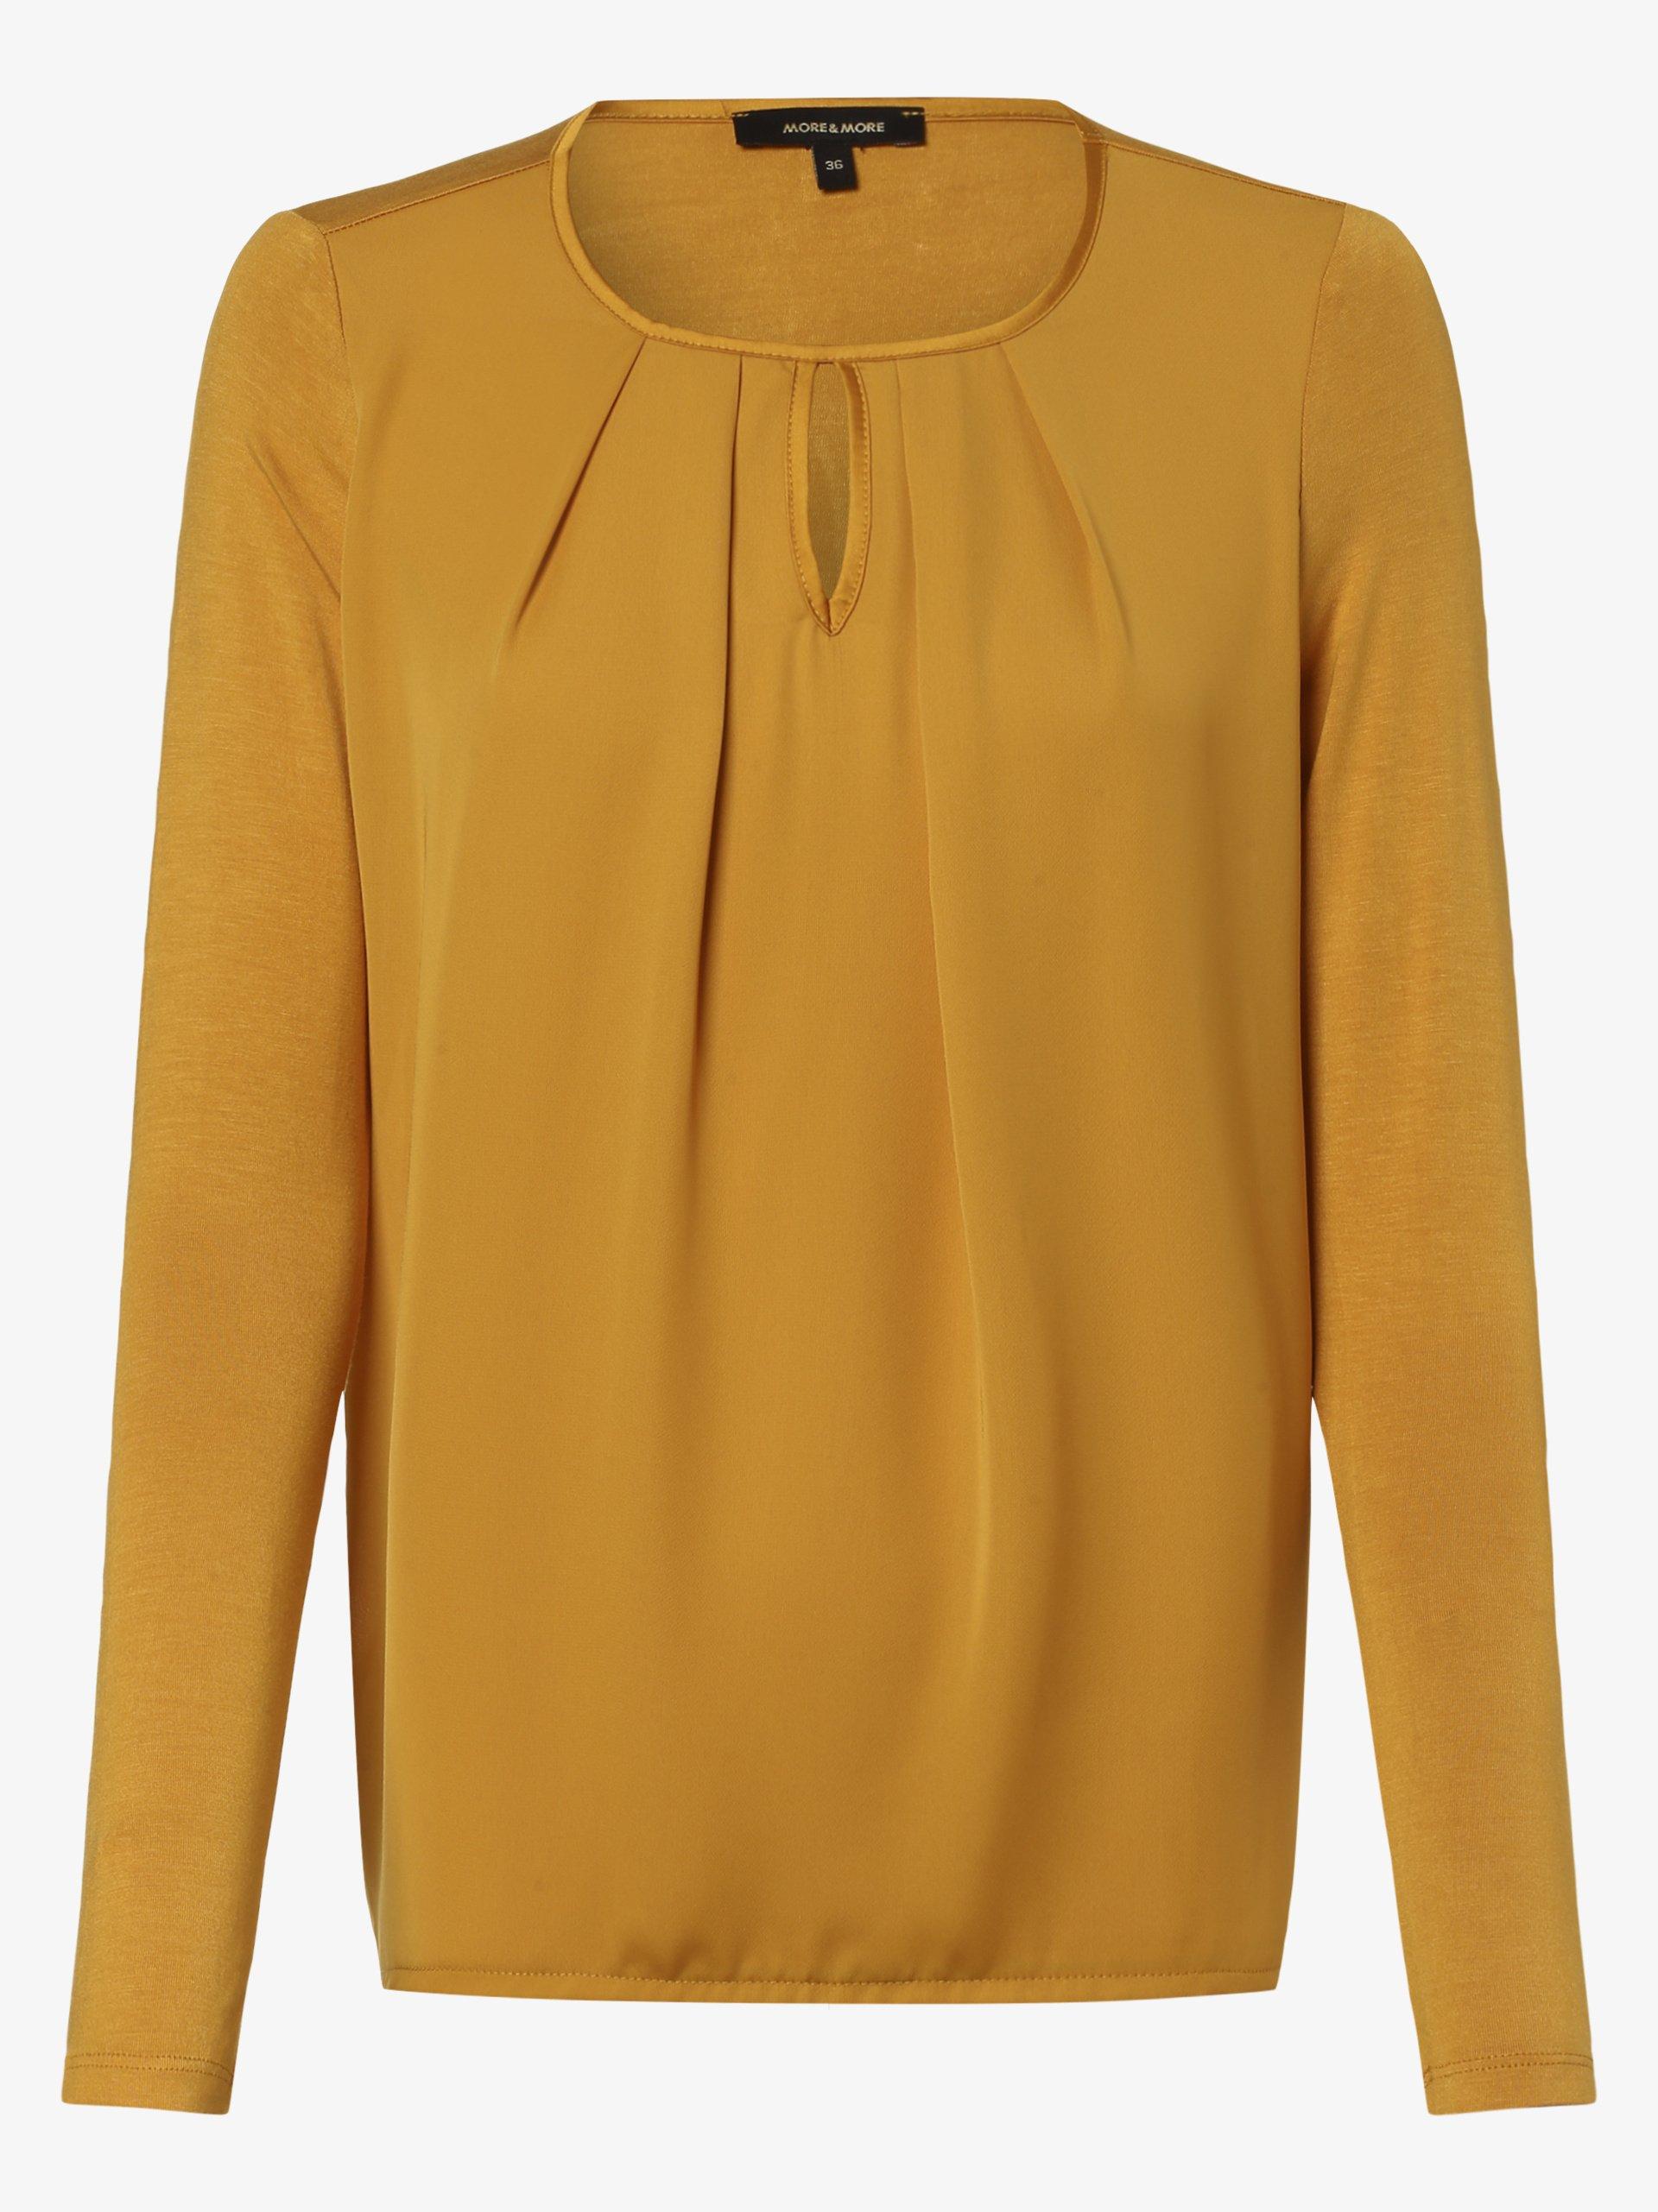 More & More Damen Blusenshirt